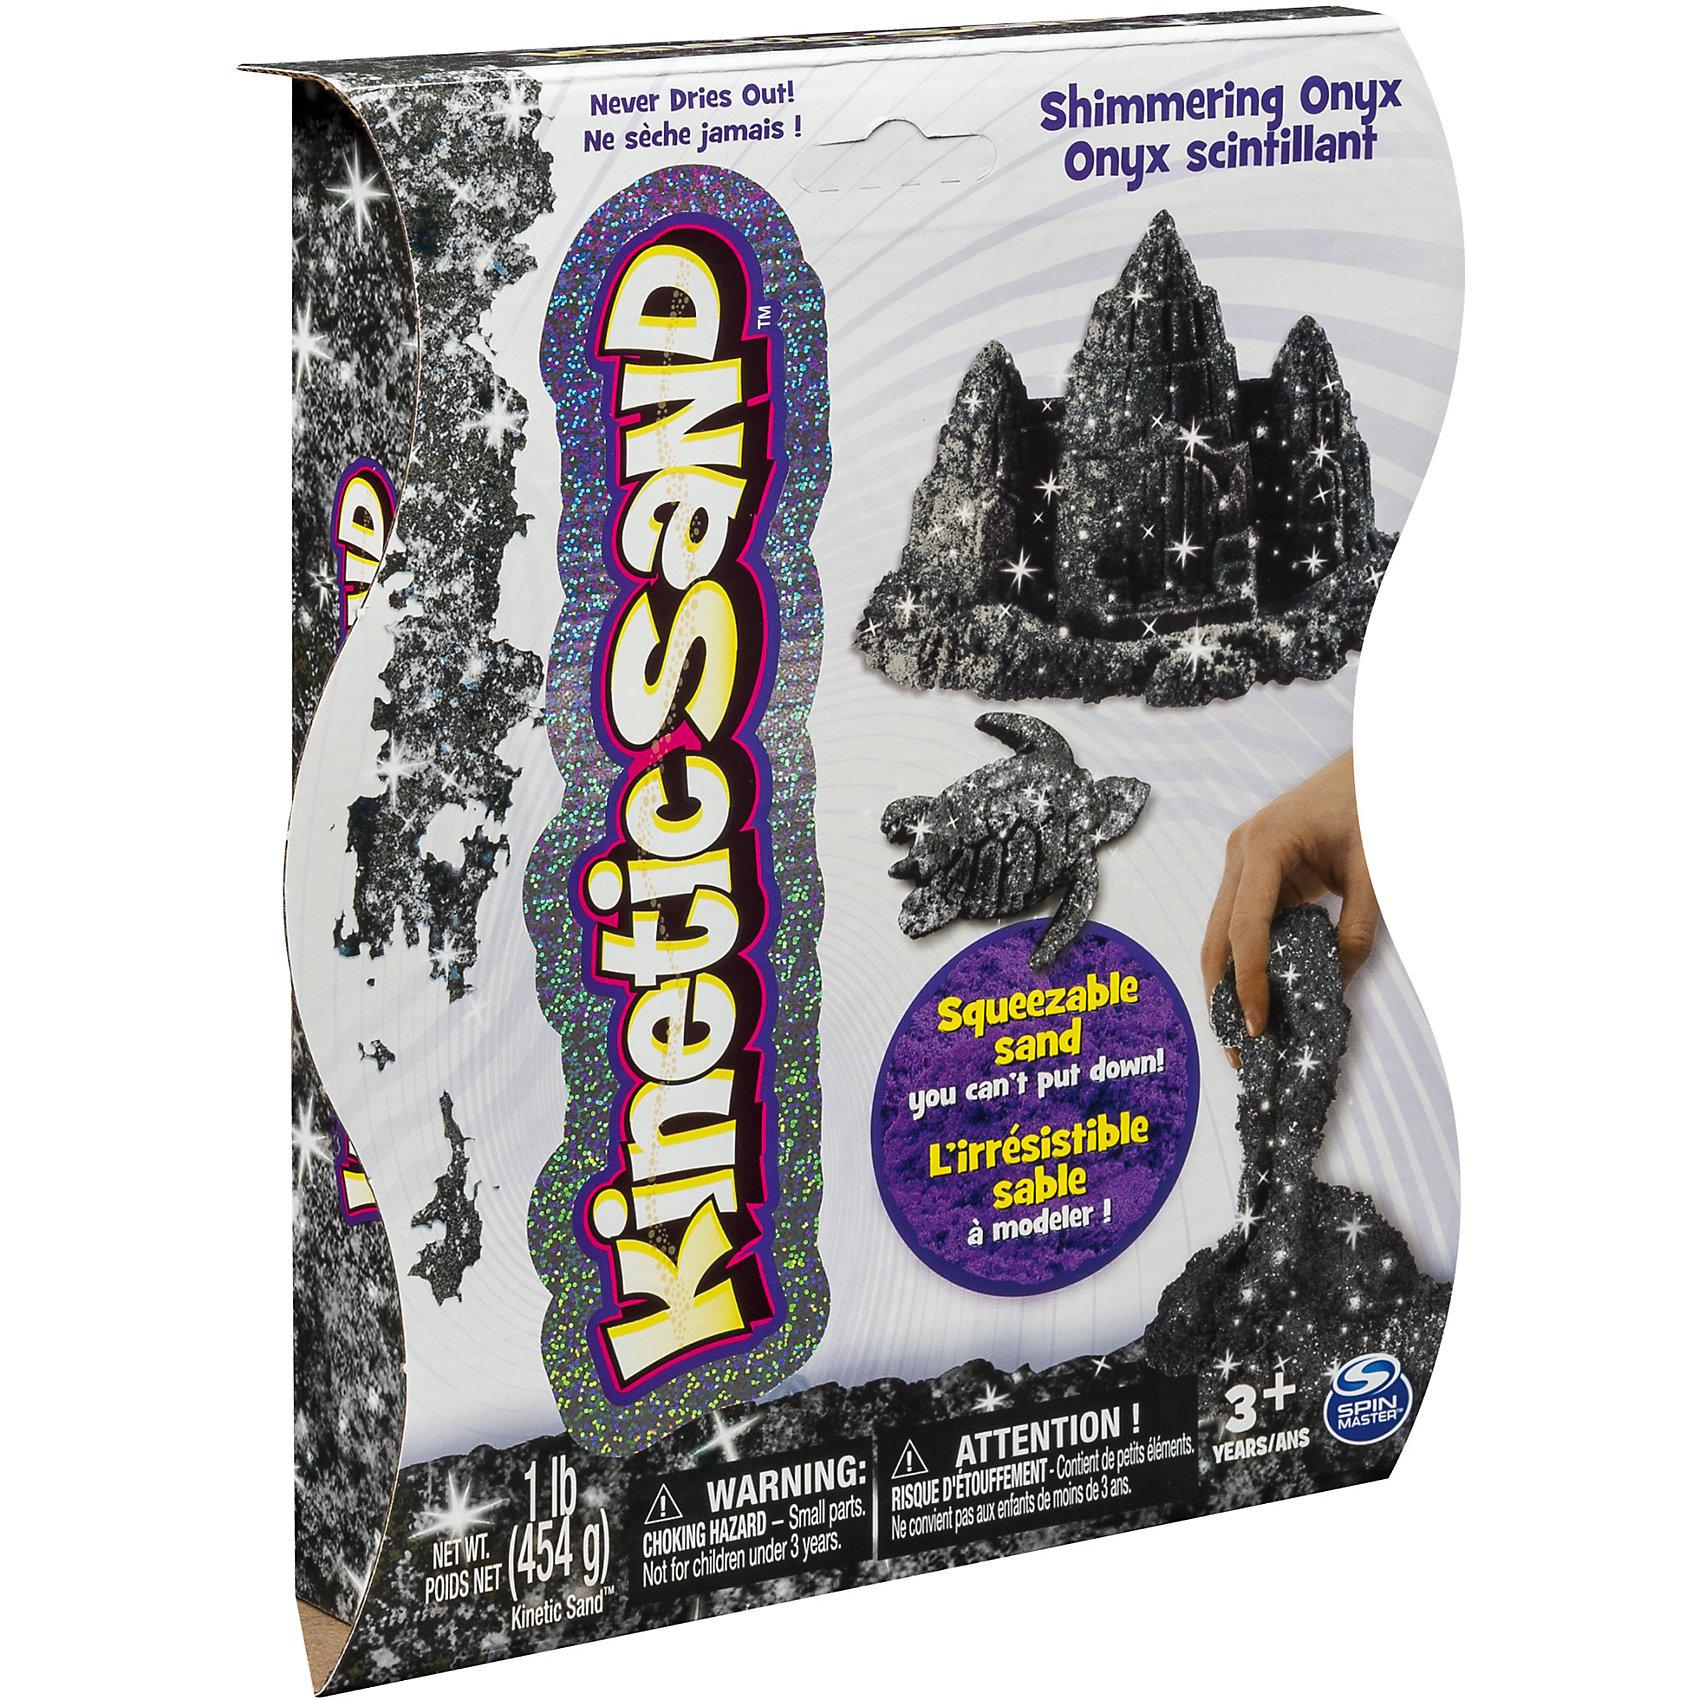 Kinetic sand Песок для лепки Kinetic sand Драгоценные камни - оникс, 455гр kinetic sand яркие цвета драгоценные камни 455 гр изумруд